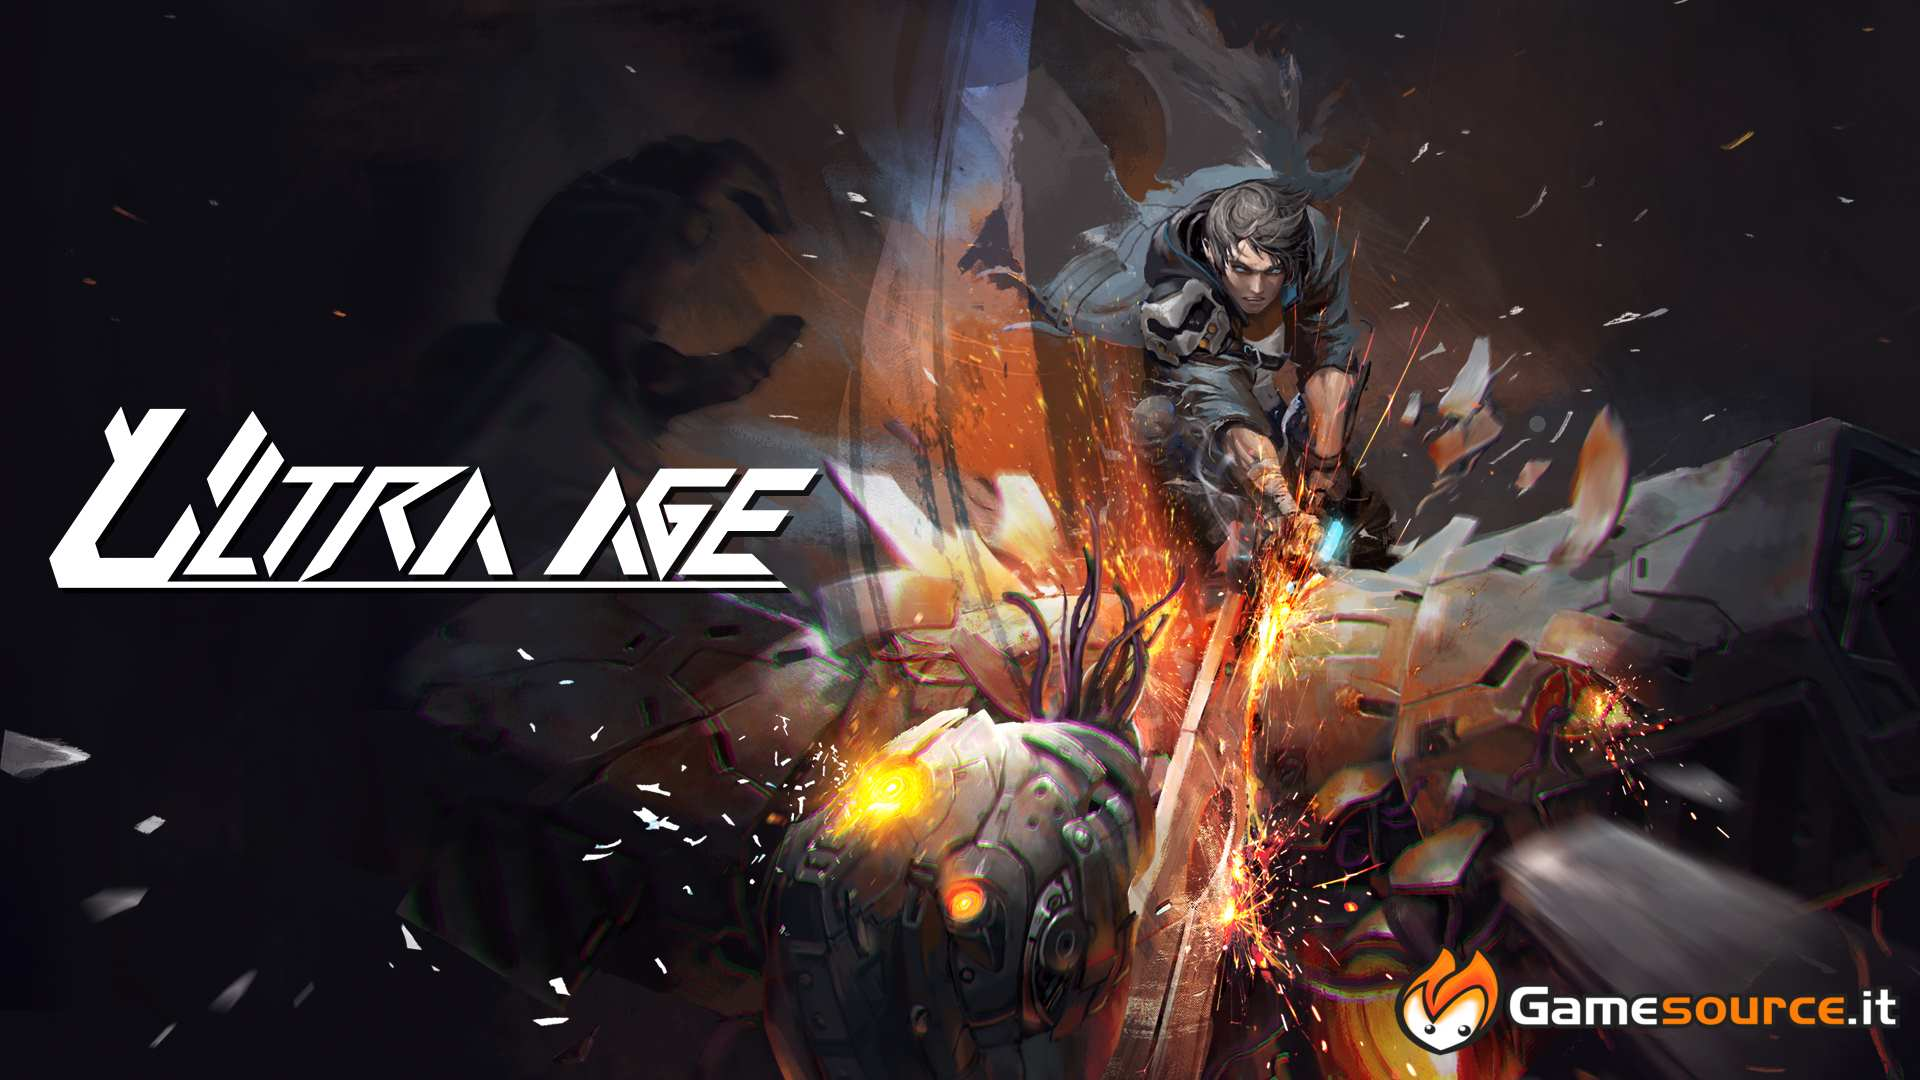 Ultra Age